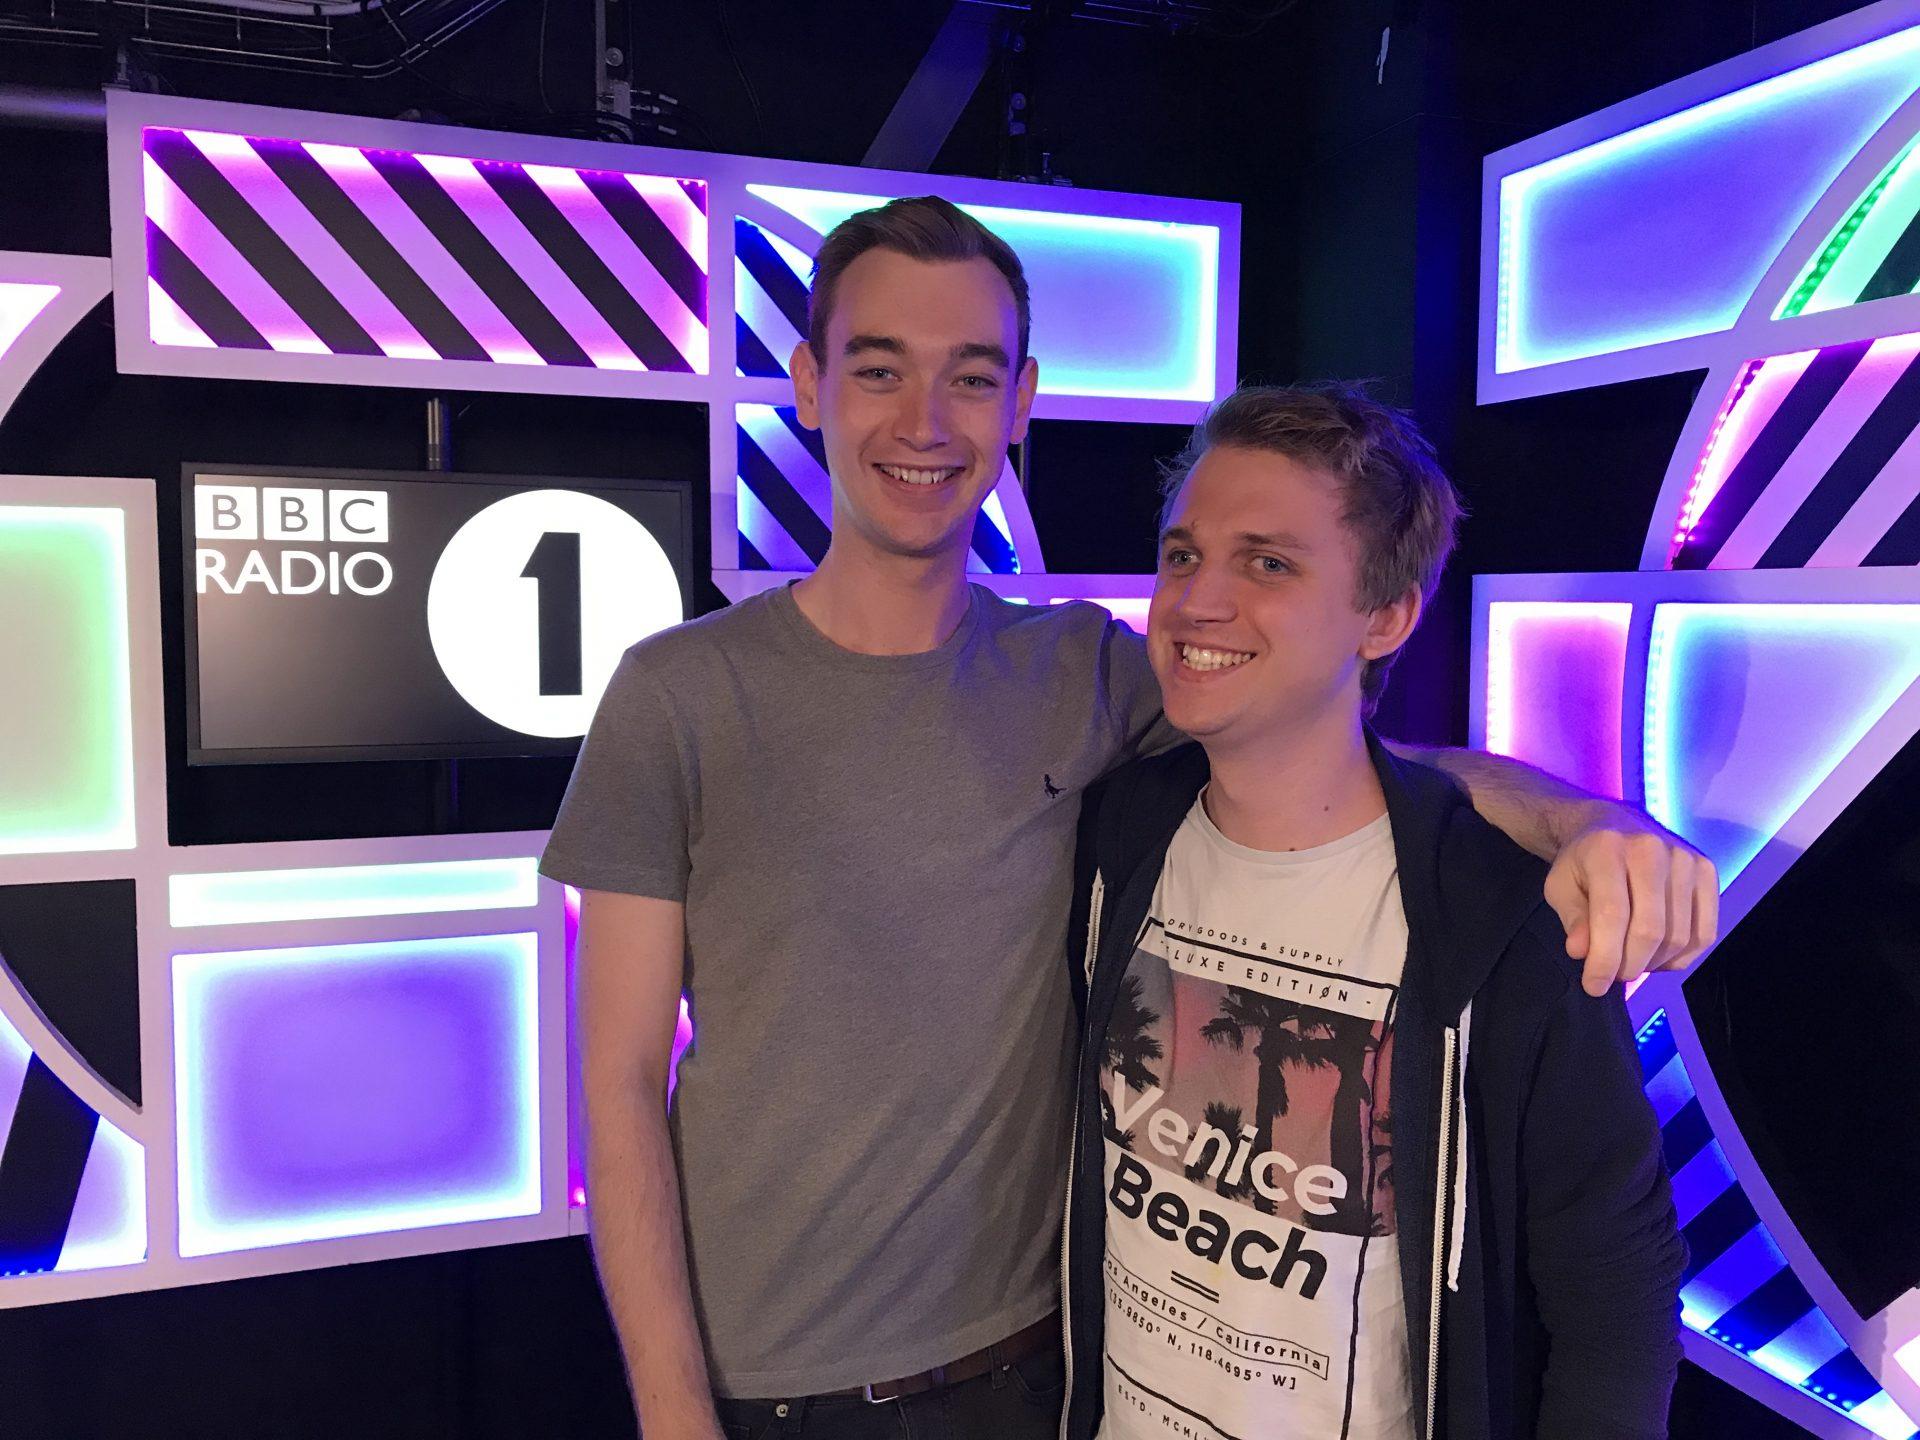 Ben Stones and Liam Hadley at BBC Radio 1